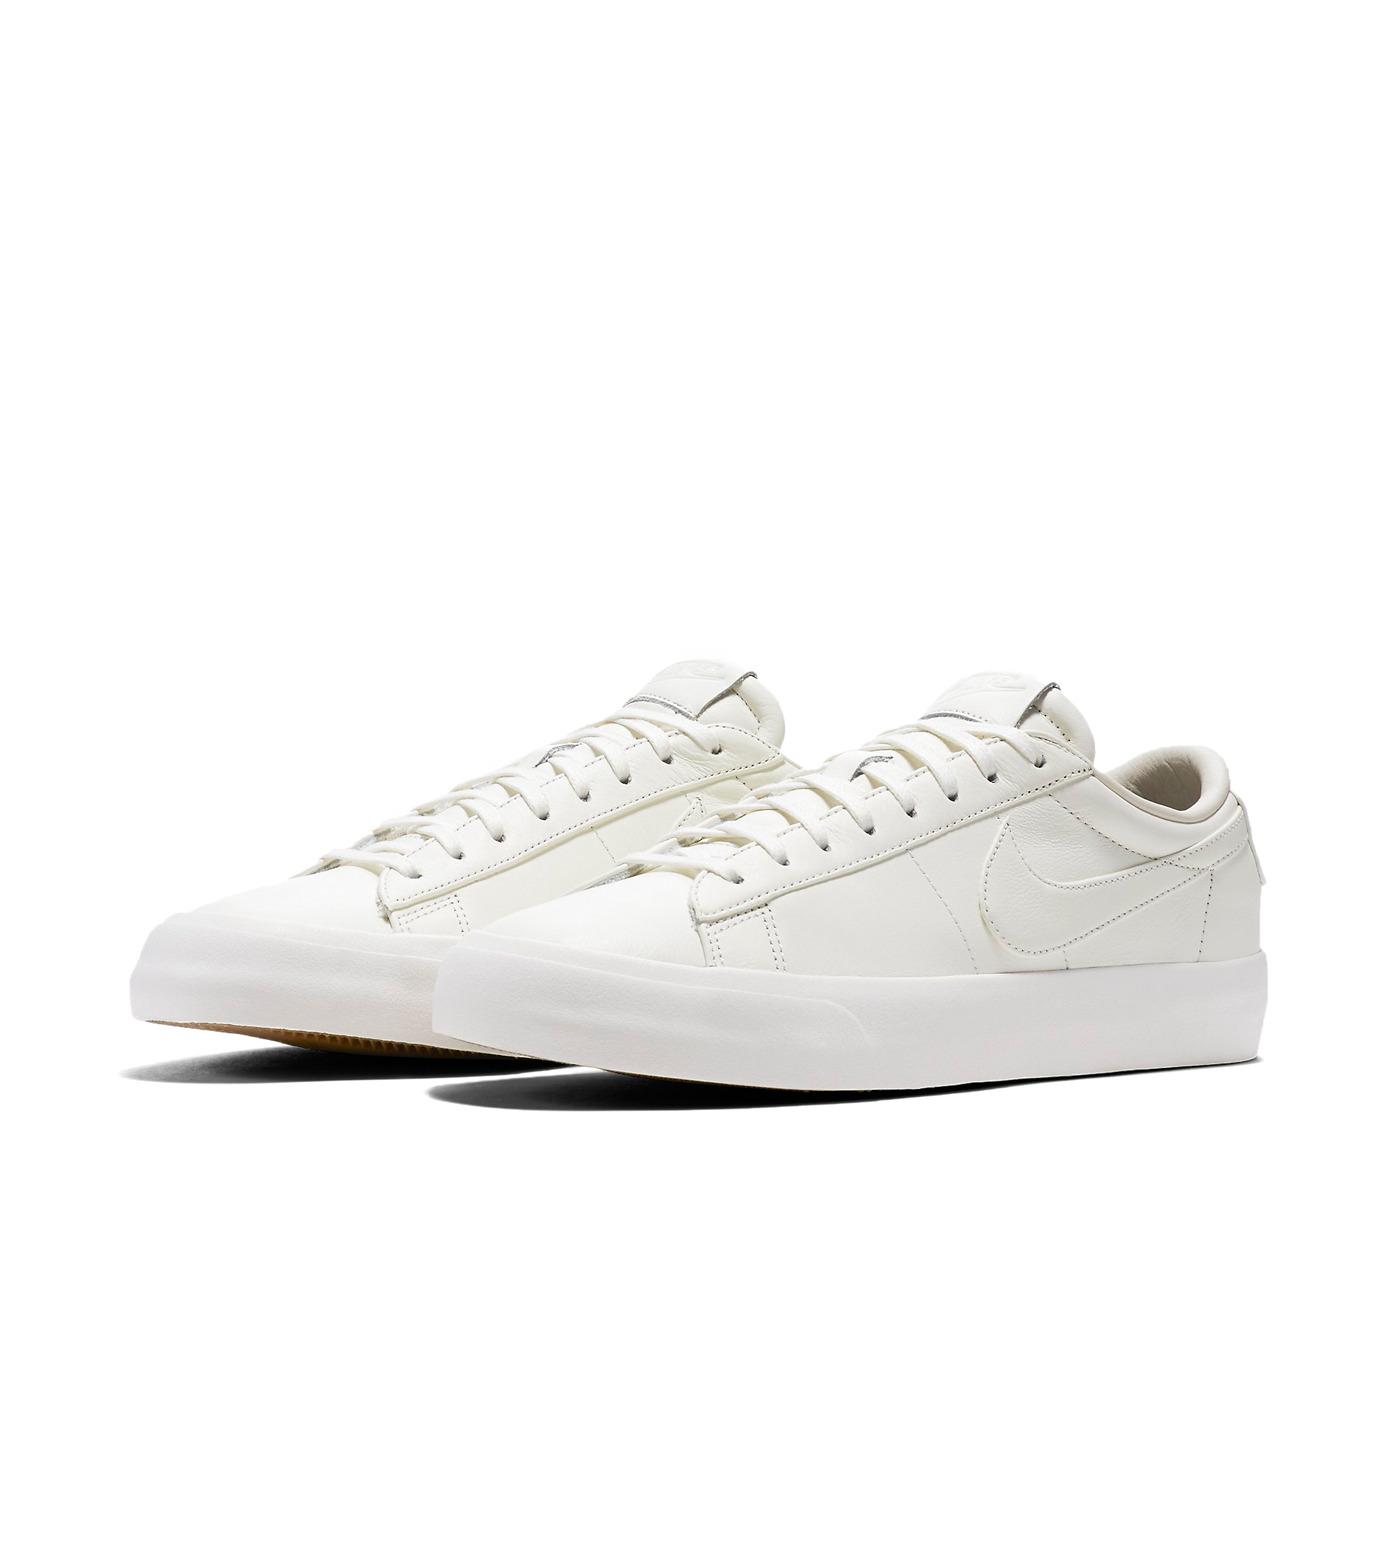 NIKE(ナイキ)のBLAZER STUDIO LOW-WHITE(シューズ/shoes)-904804-100-4 拡大詳細画像4